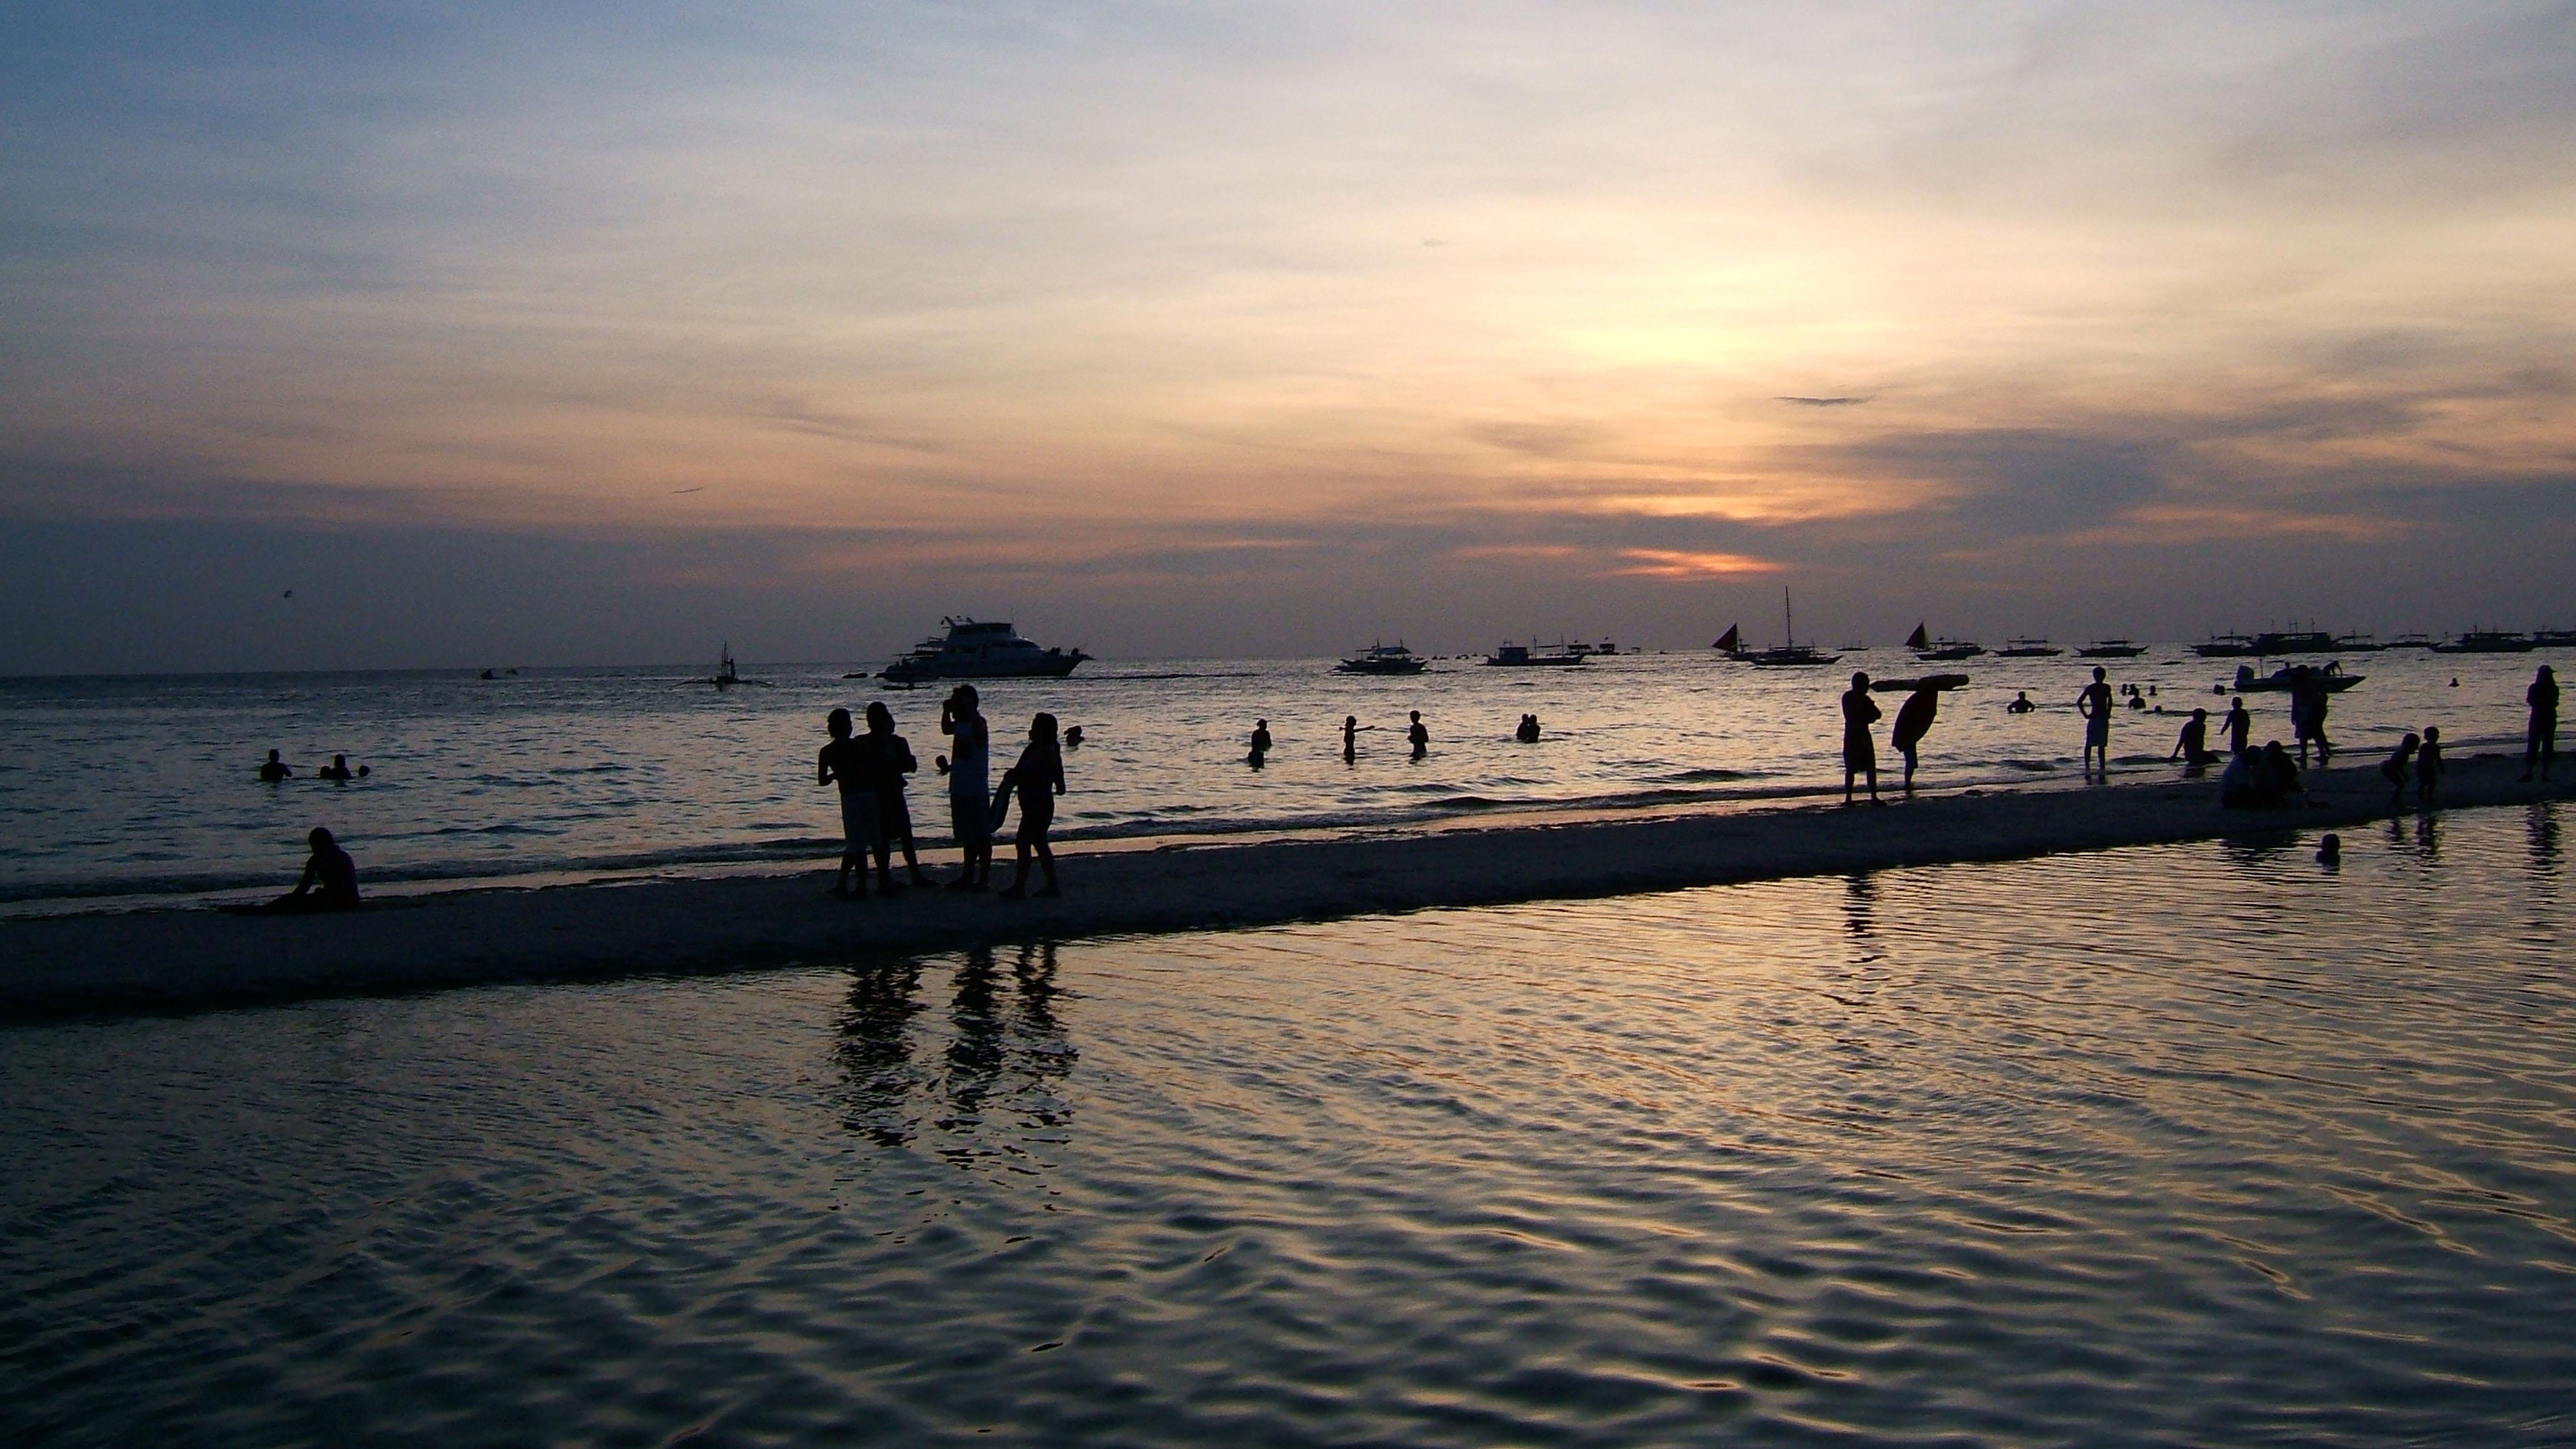 Sunset Philippines Boracay Beach 02